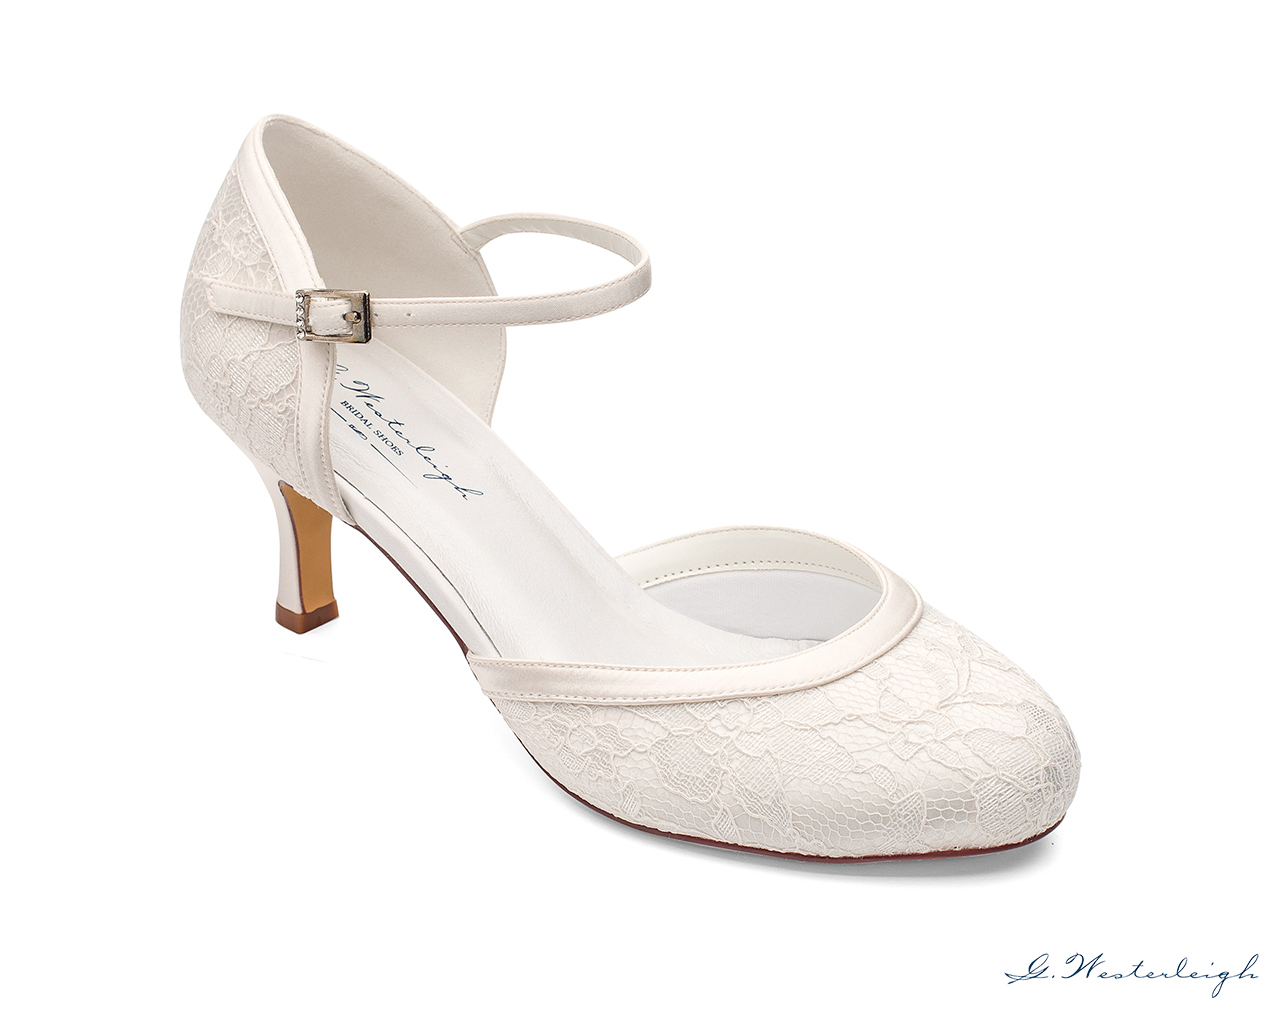 7cadded100 Daisy Menyasszonyi cipő- gwesterleigh.com